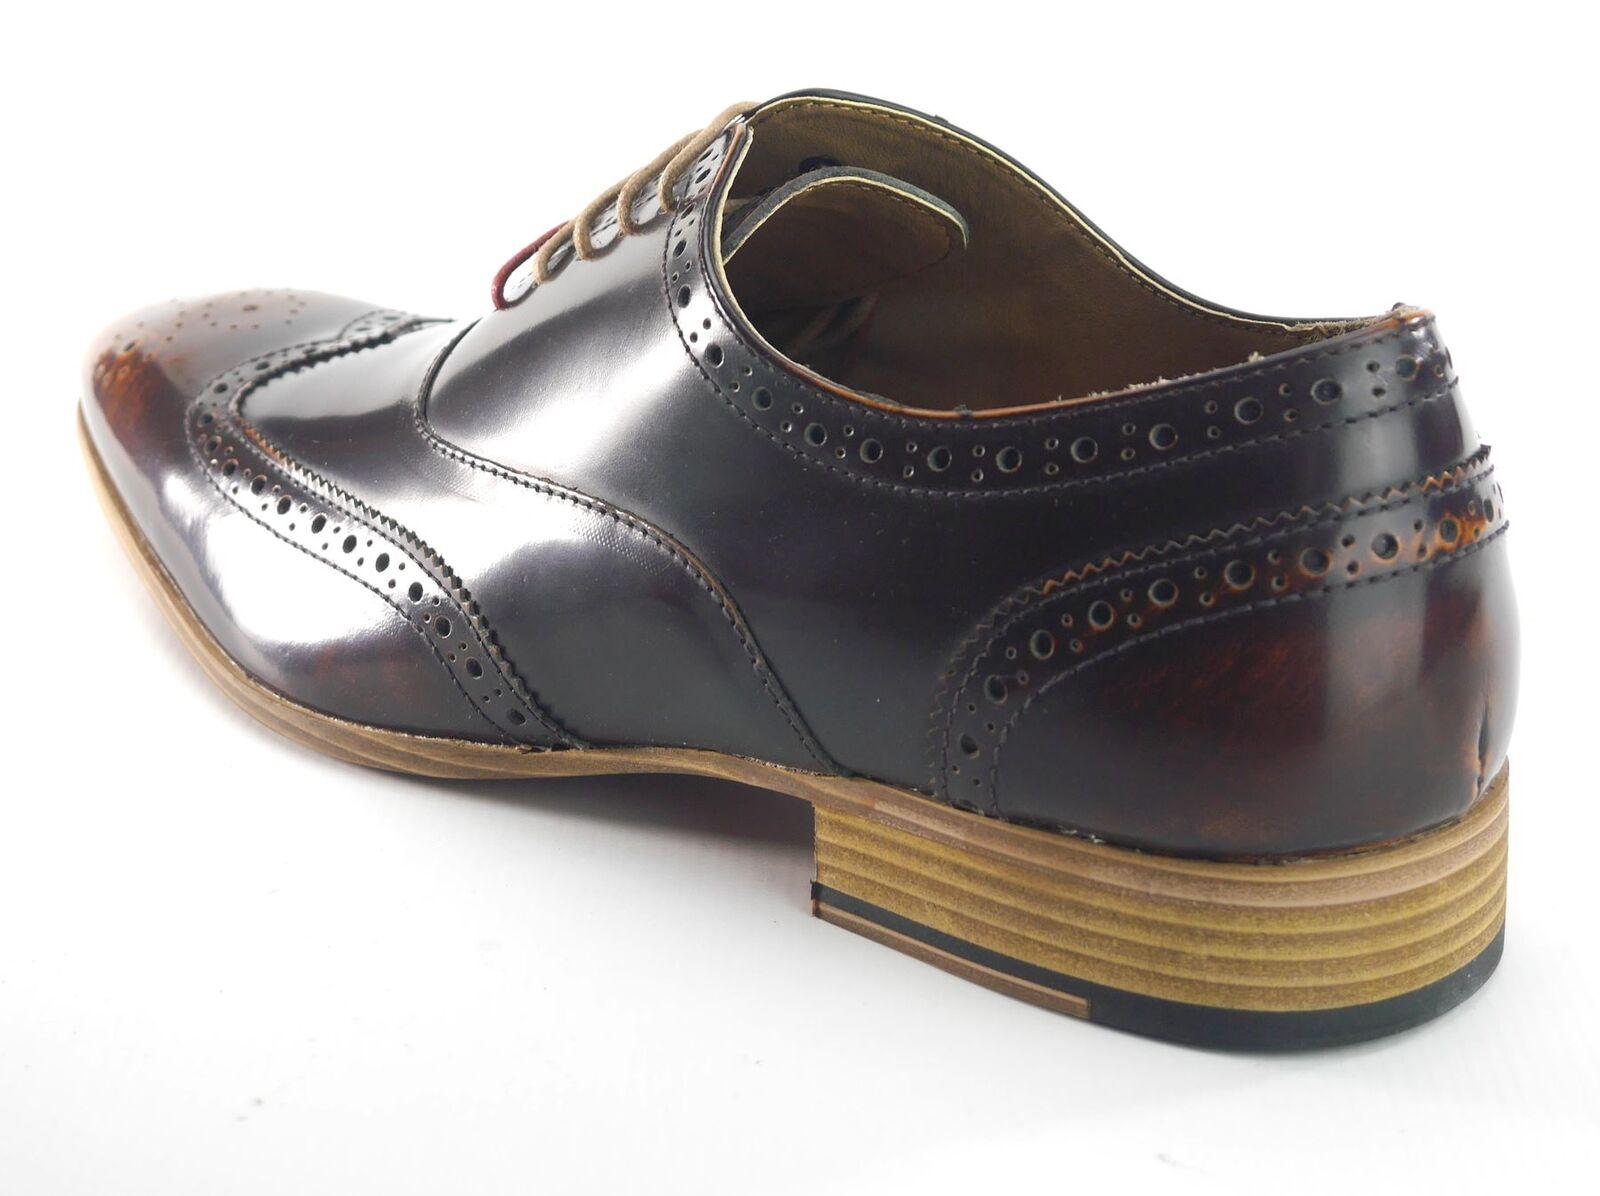 Frank James Norbury Hi  Shine  Hi  Herren Lace Up Brogue Lace Up Schuhes Braun b8ac01